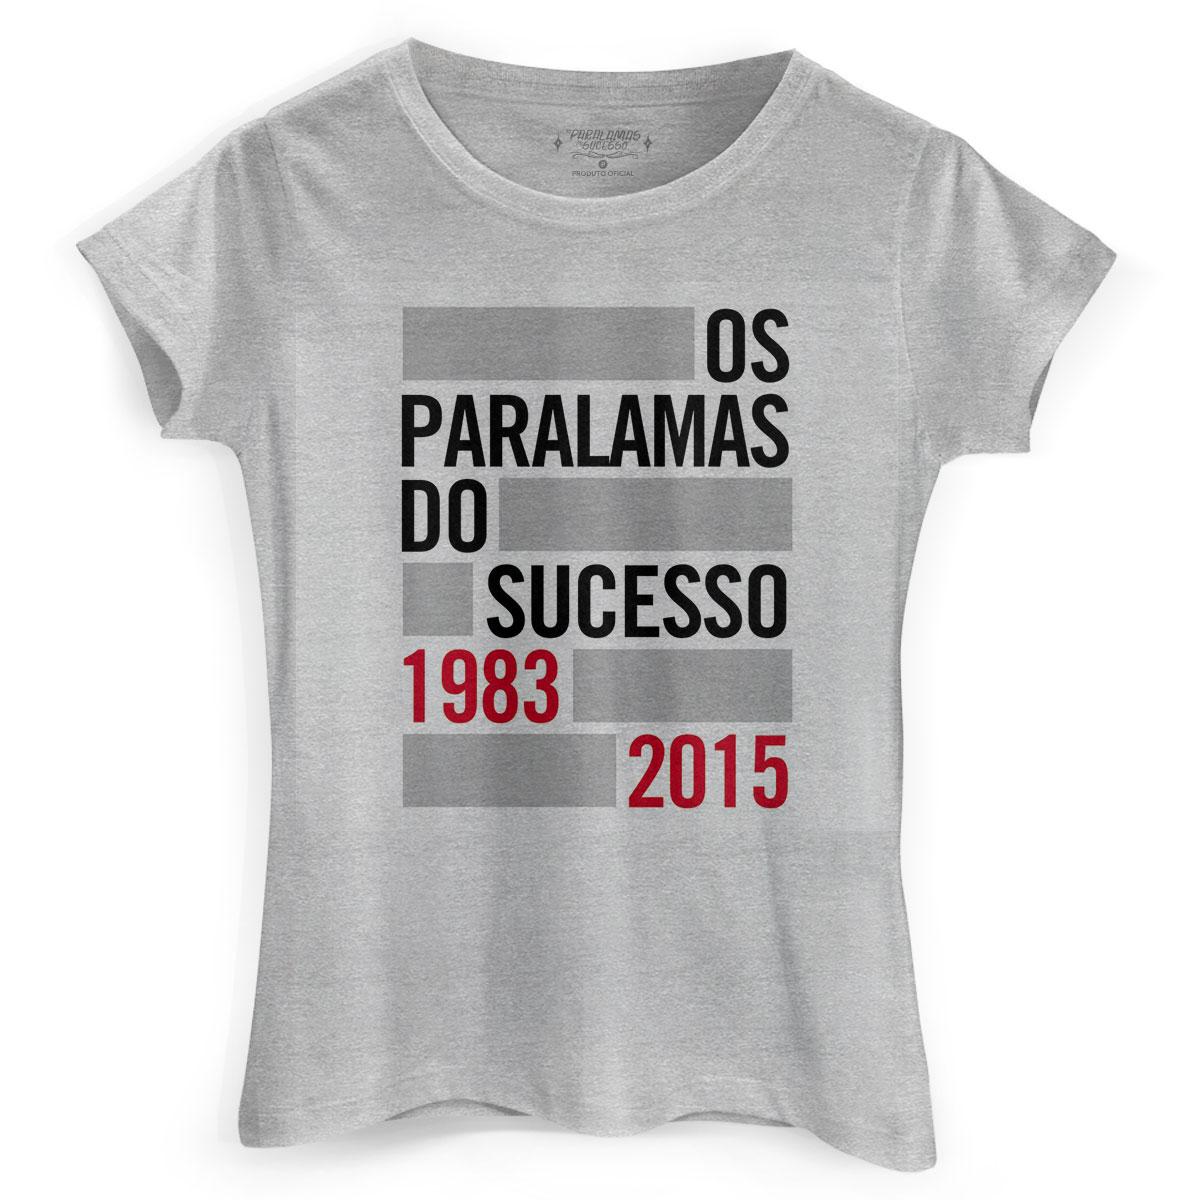 Camiseta Feminina Os Paralamas do Sucesso 1983-2015